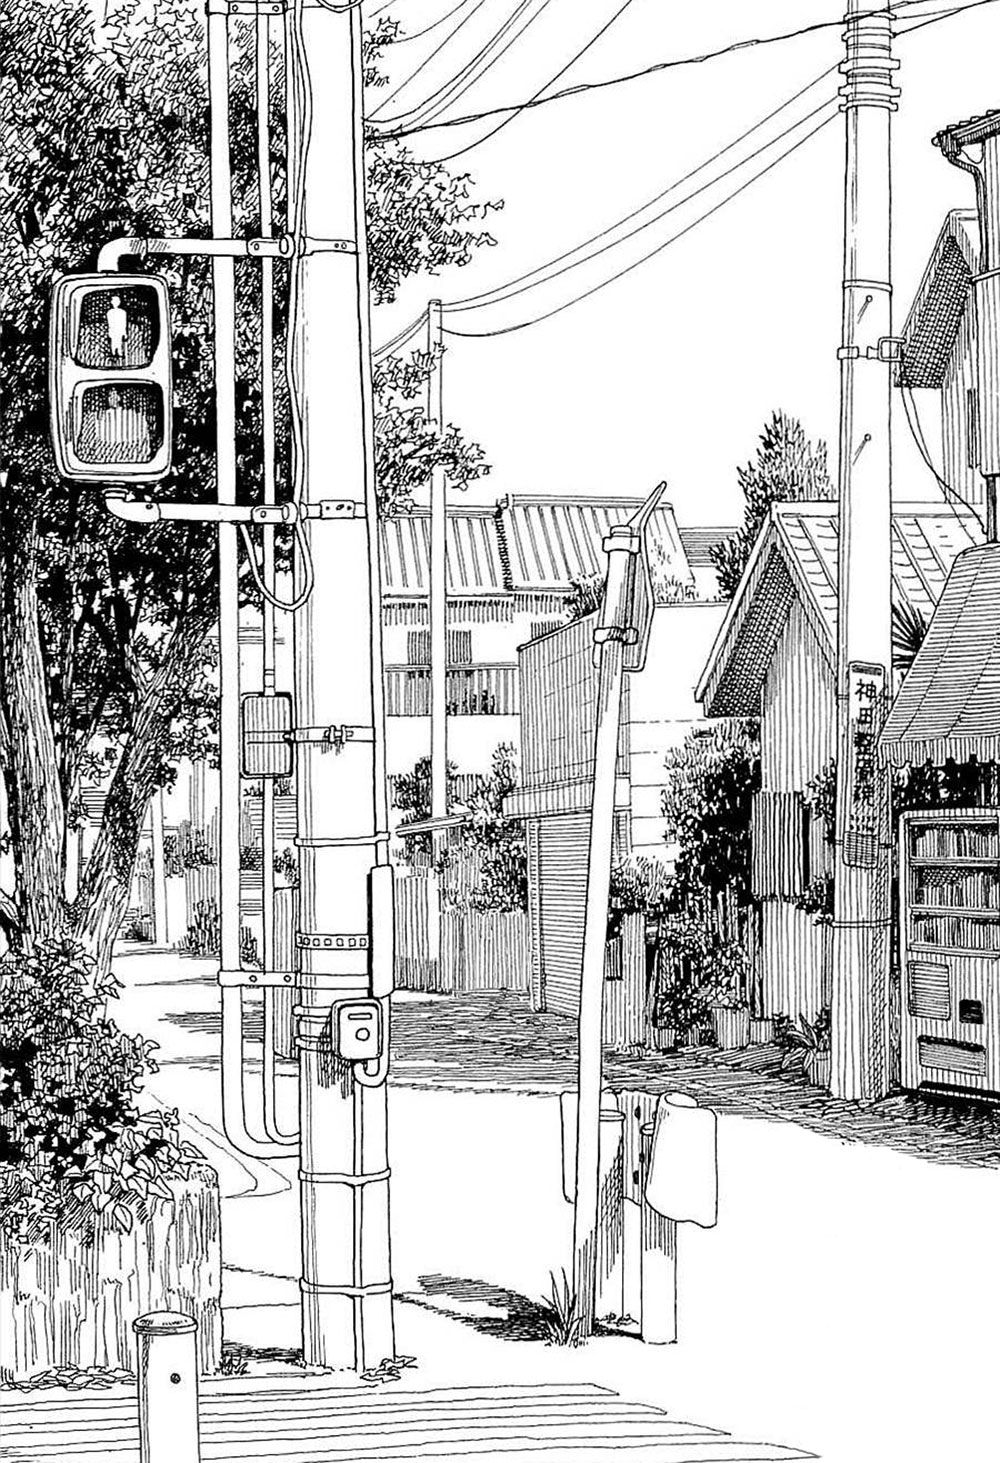 Kiyohiko Azuma Artnau Bocetos Arquitectonicos Paisaje Urbano Arte En Perspectiva